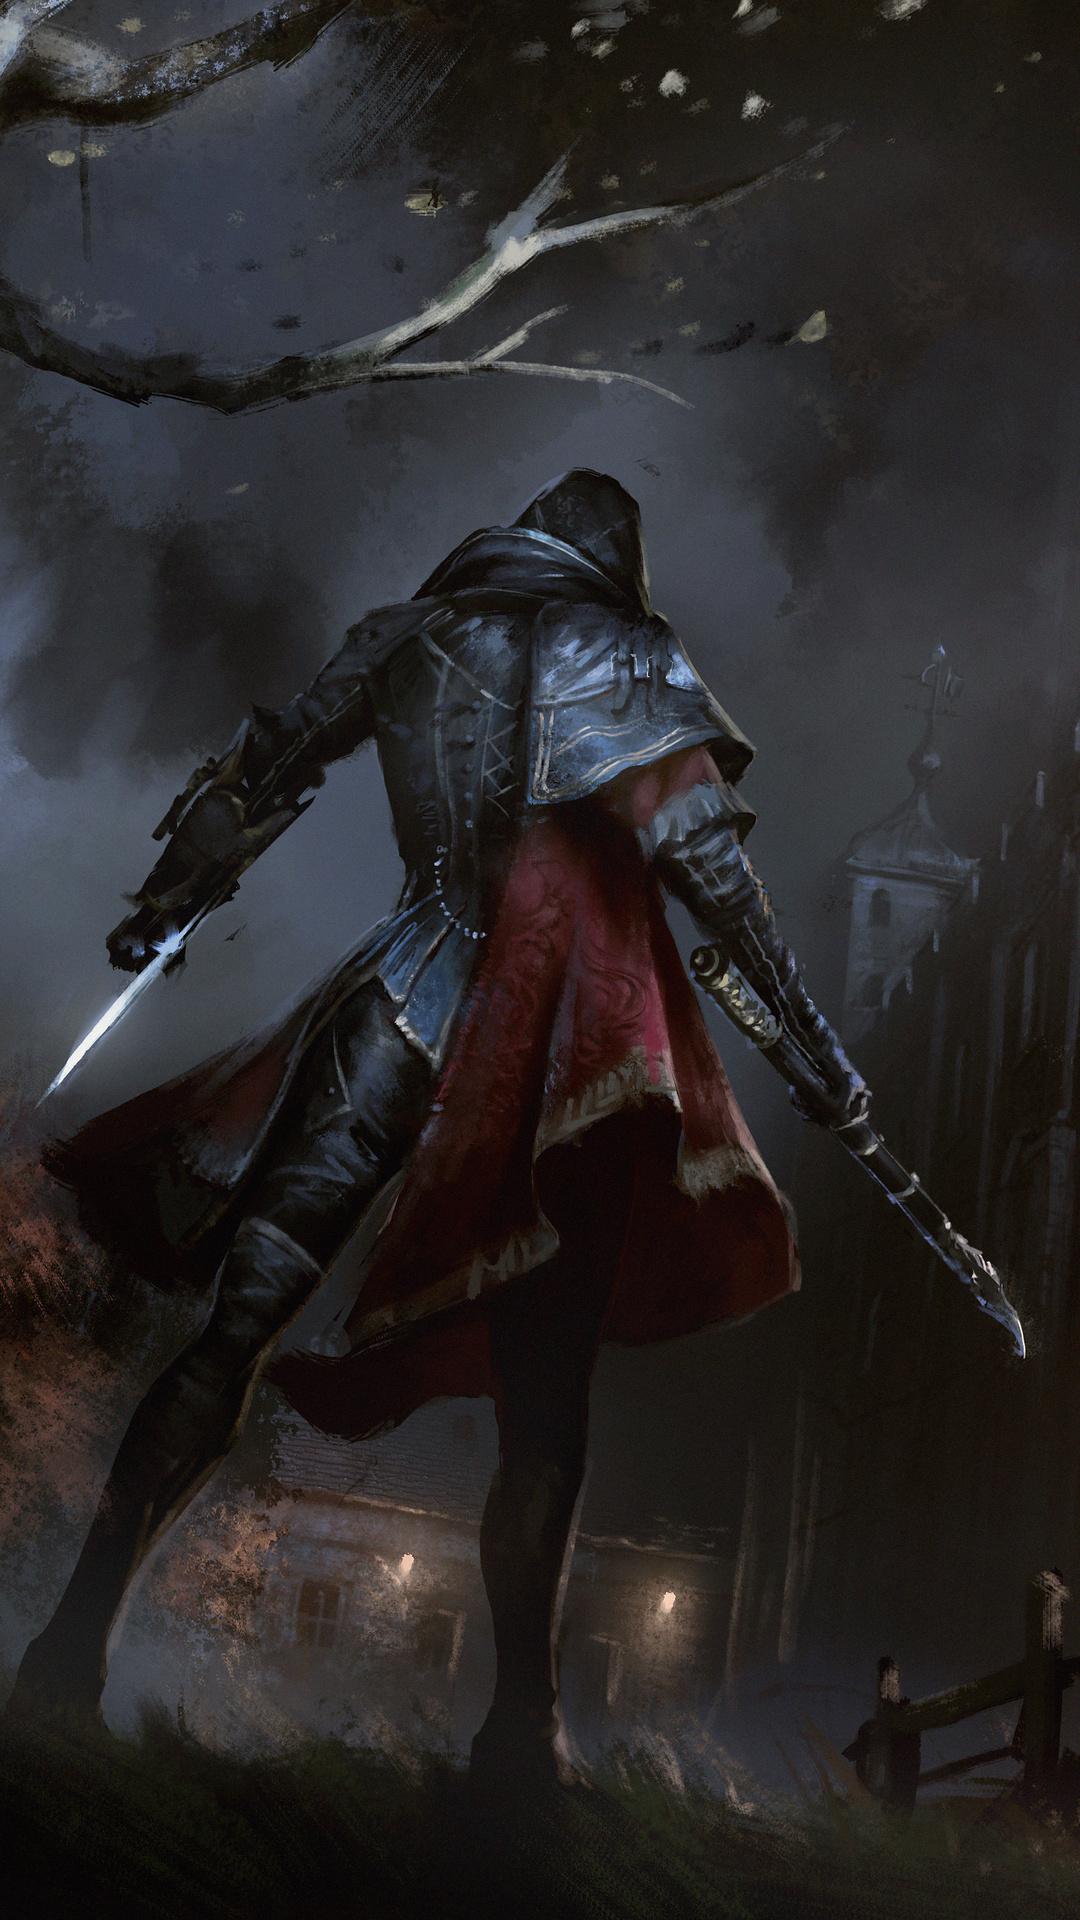 assassins-creed-syndicate-2019-5k-fr.jpg